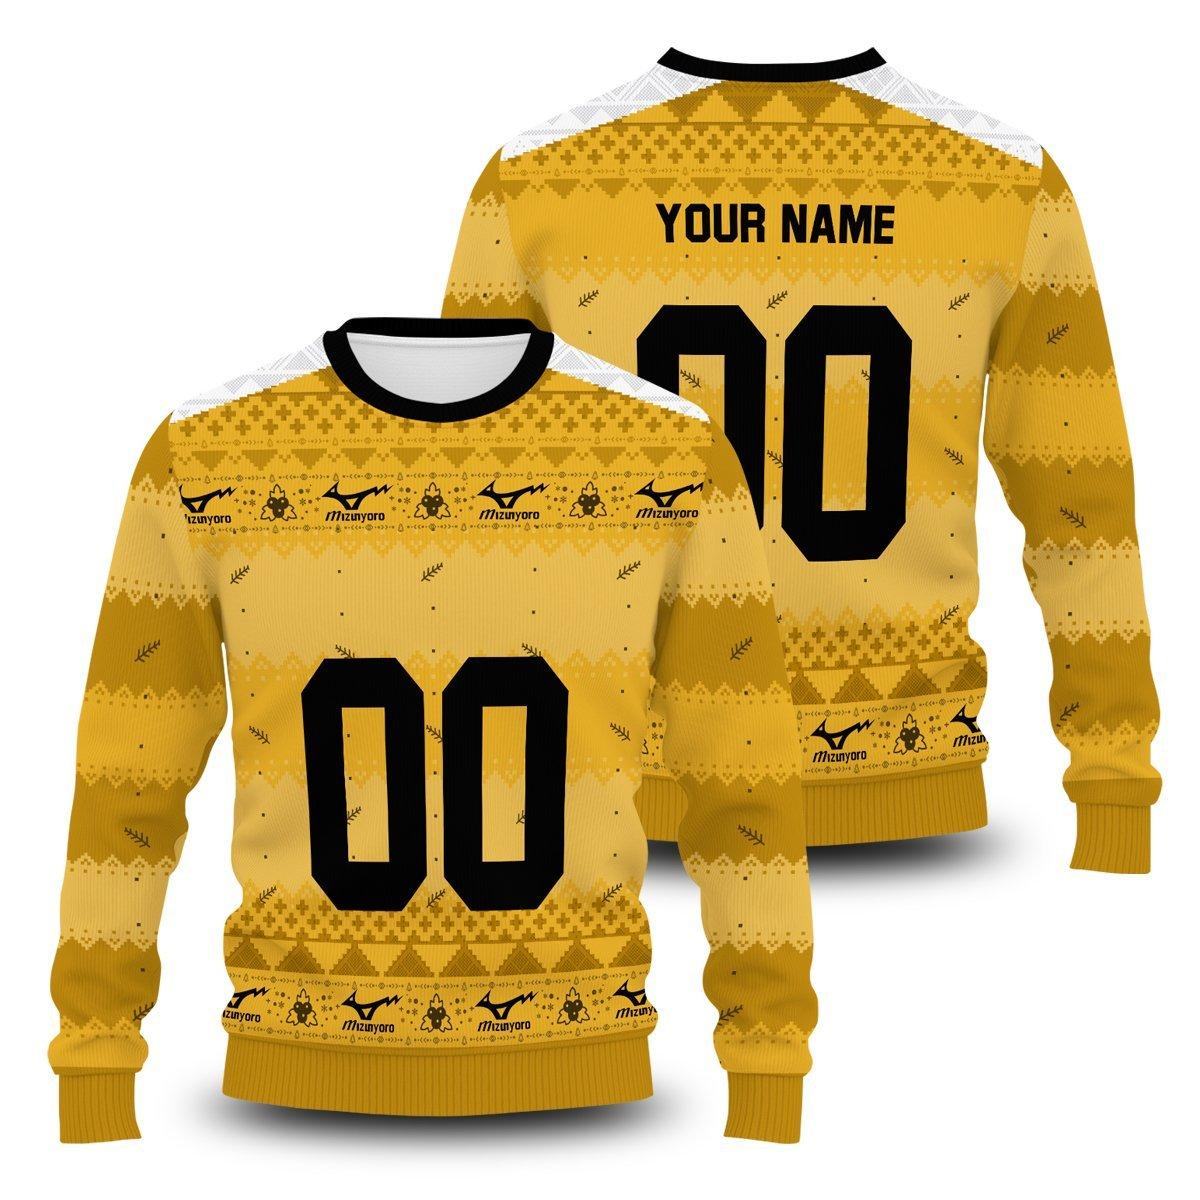 Personalized Team Johzenji Christmas Unisex Wool Sweater FDM0310 S Official Otaku Treat Merch